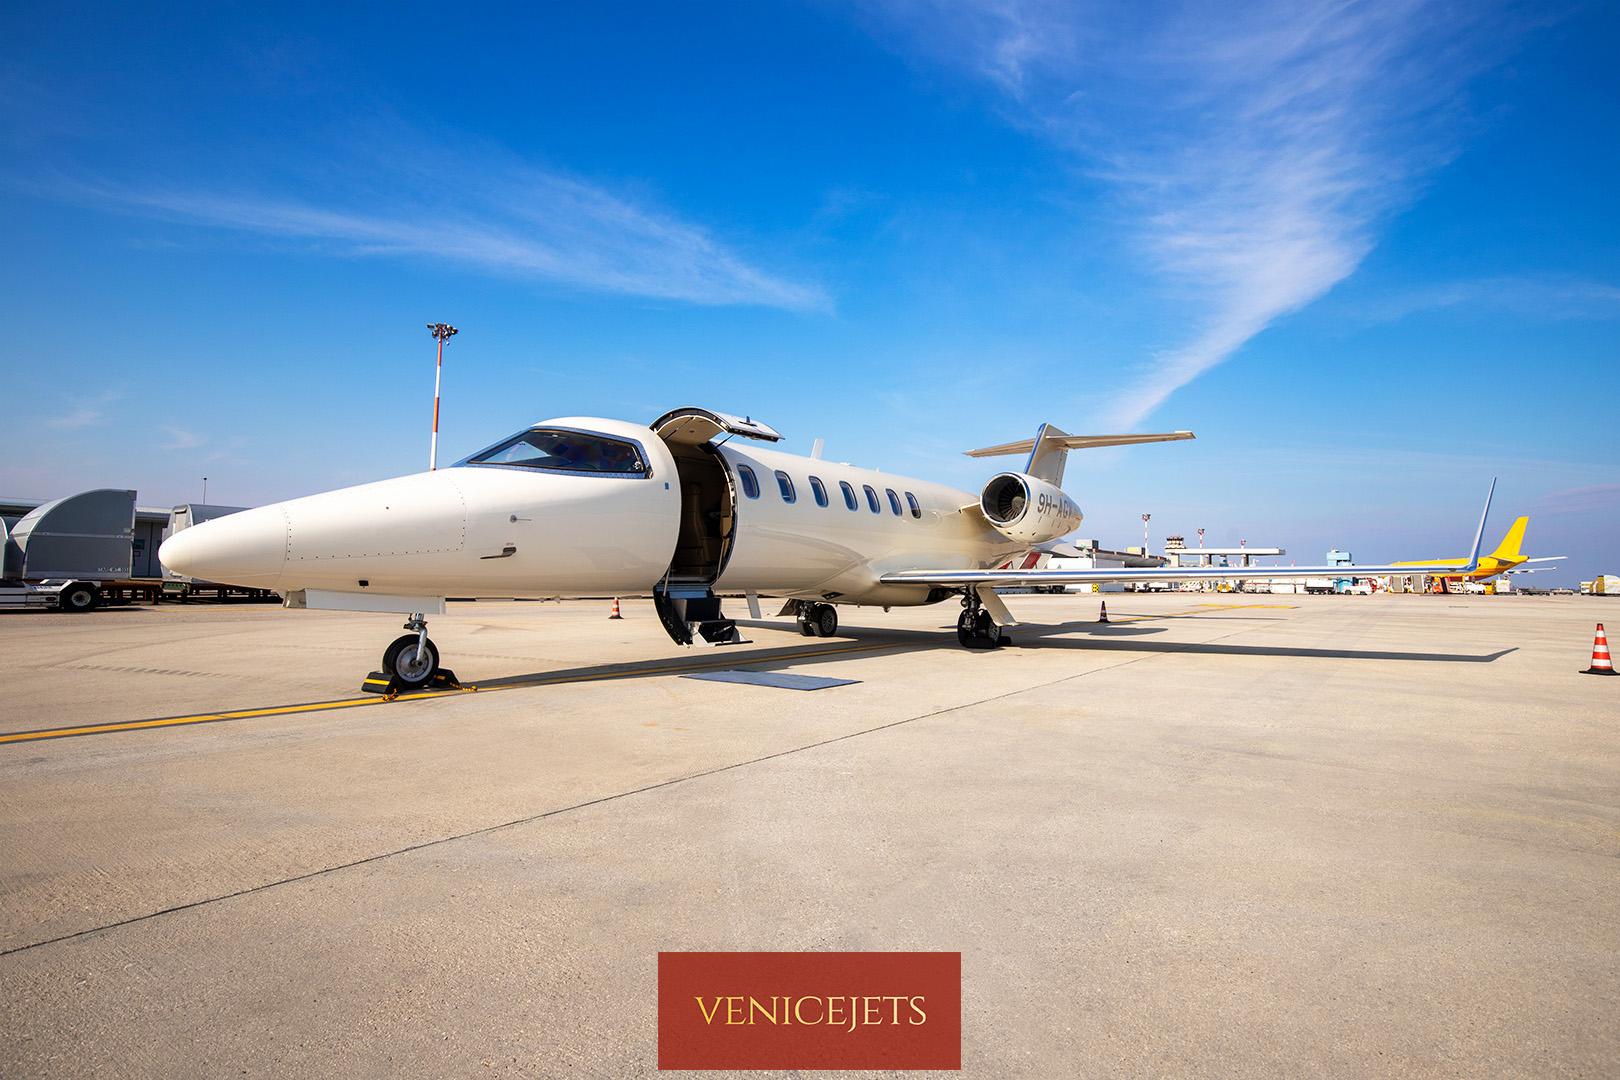 Learjet 40 - exterior